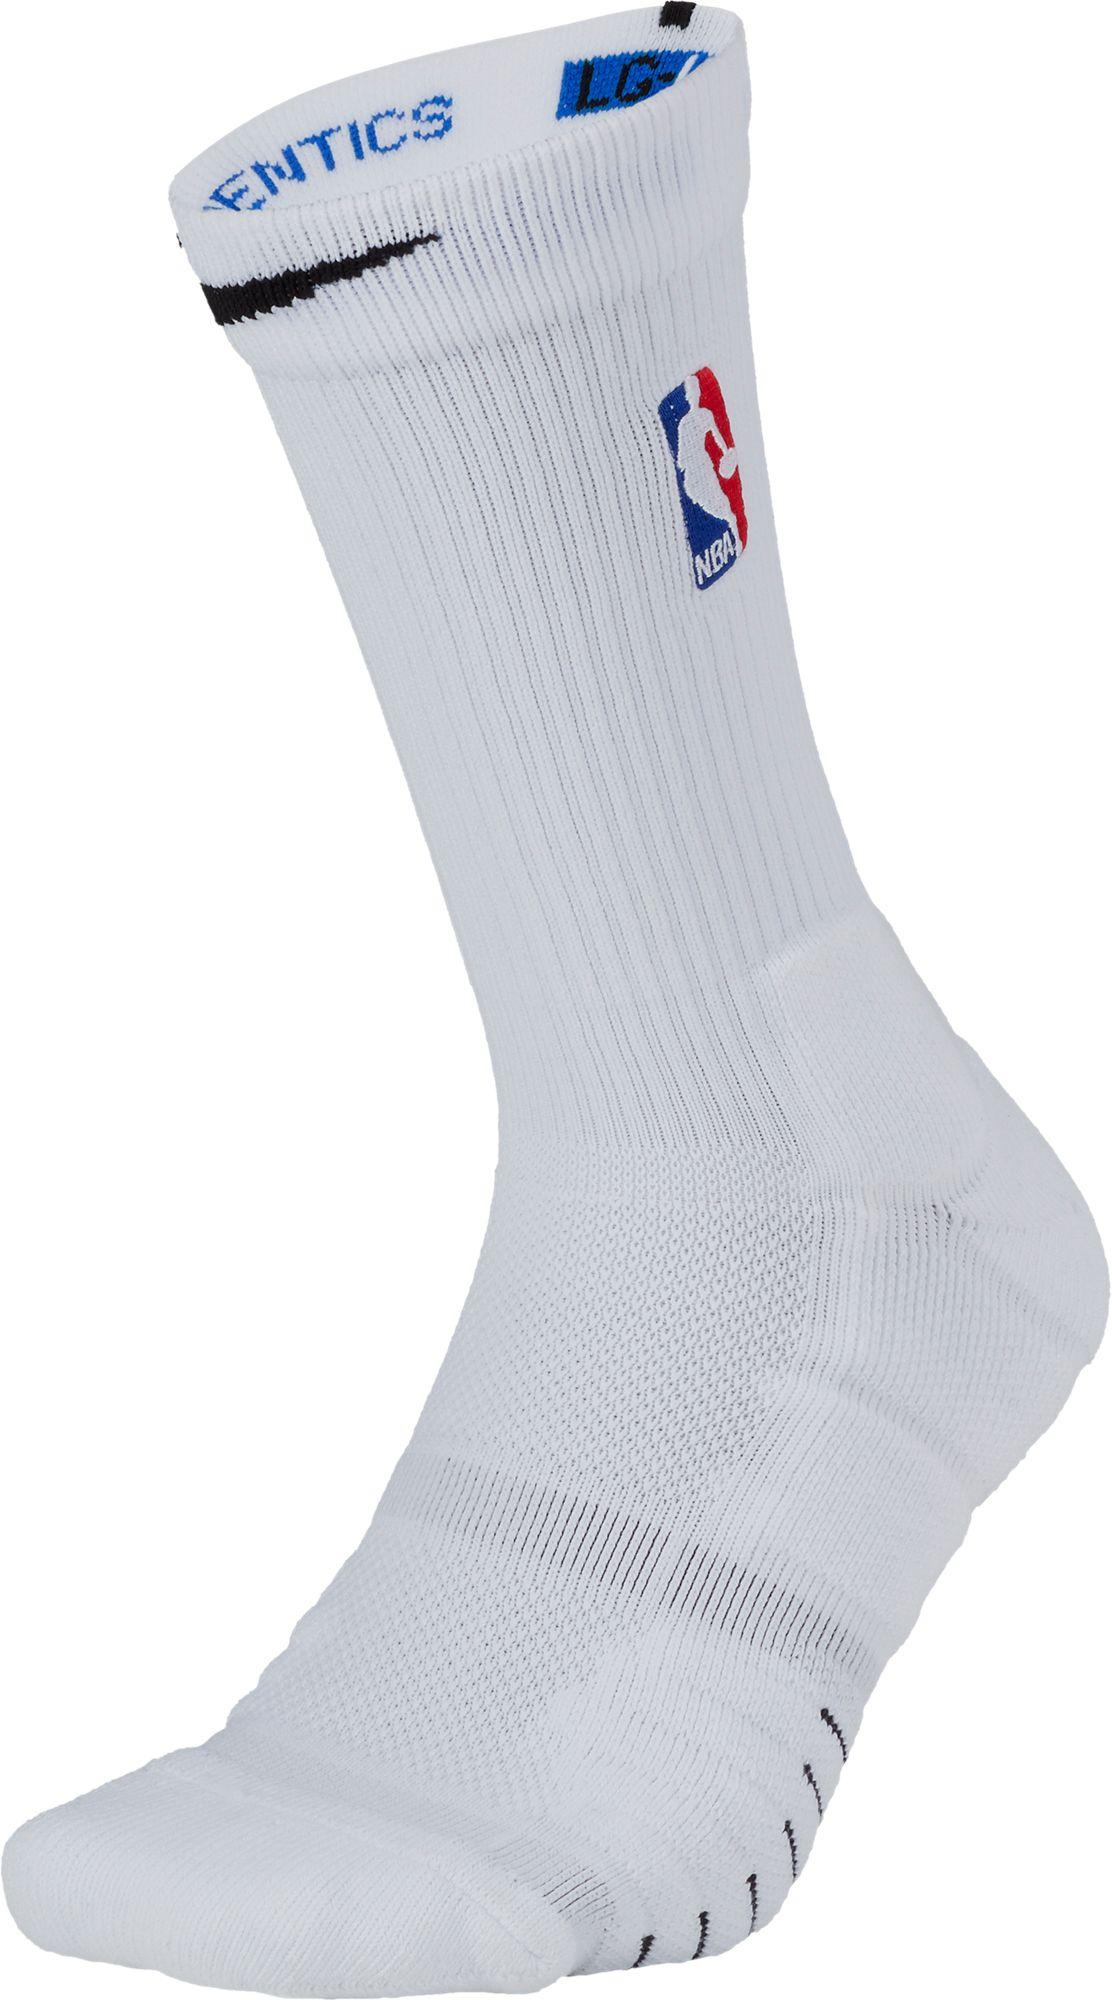 Teen lilly socks